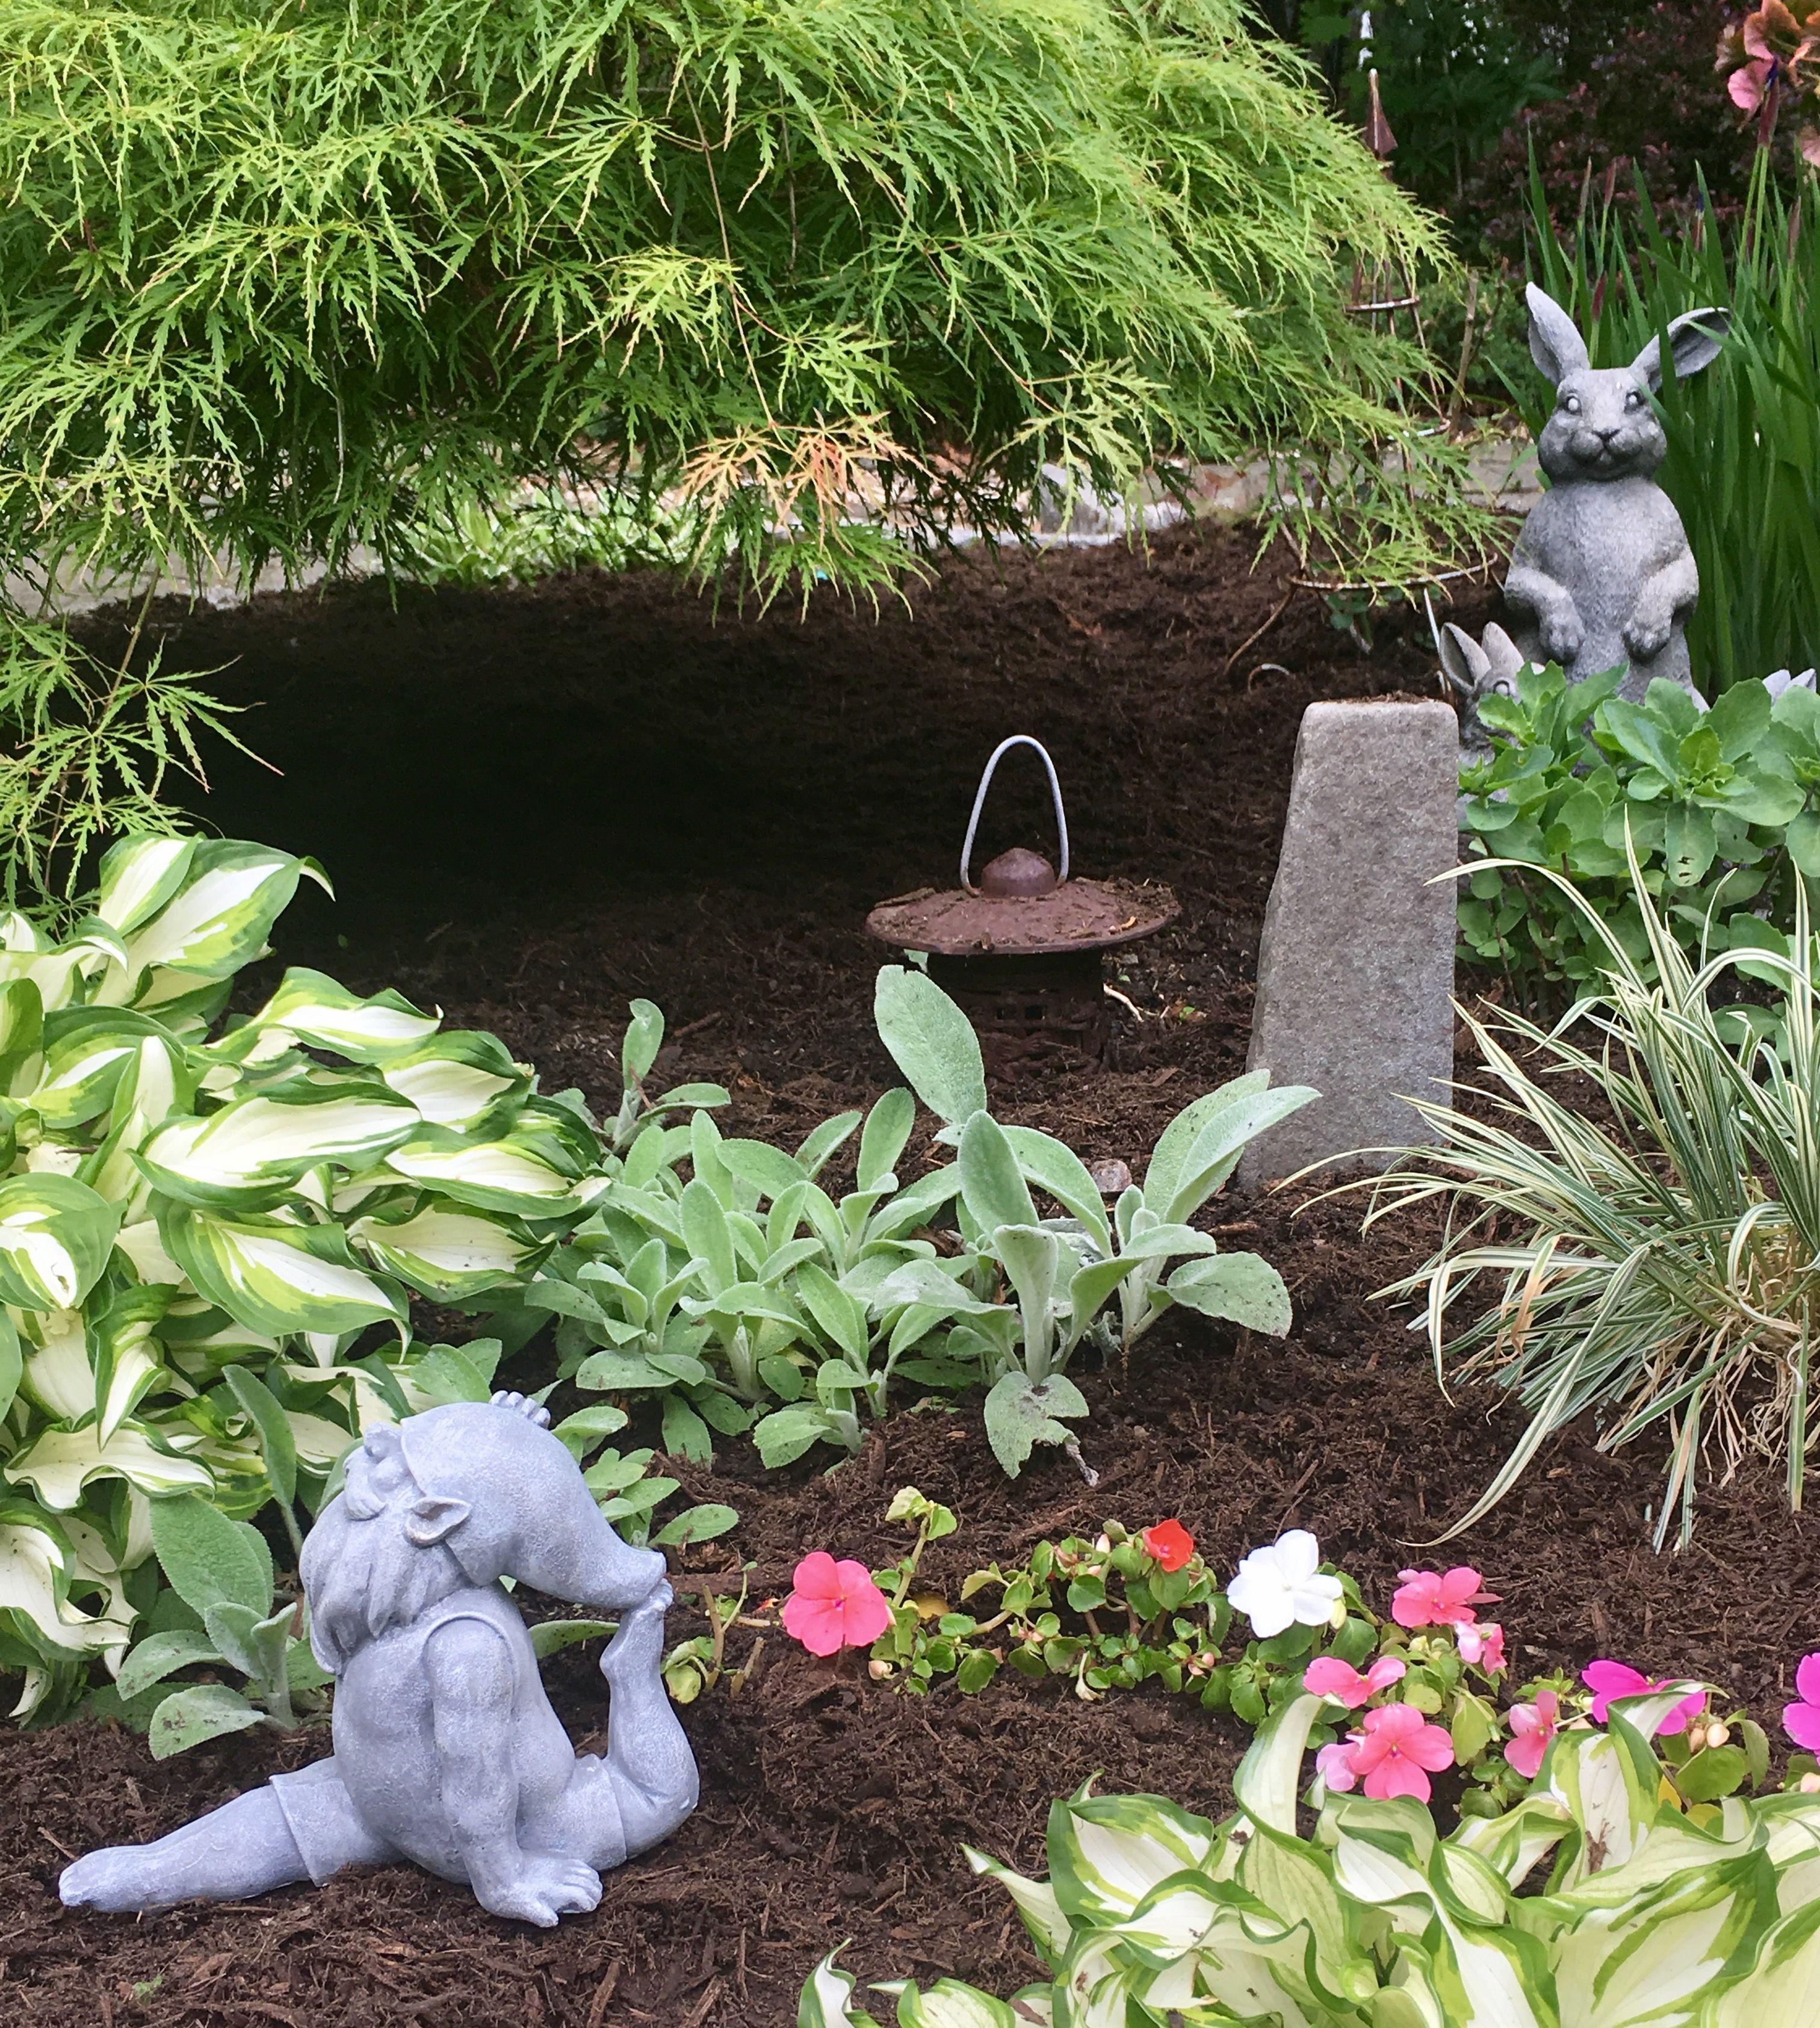 Zen Gardens, Gardening, Garden, Yard Landscaping, Urban Homesteading, Horticulture